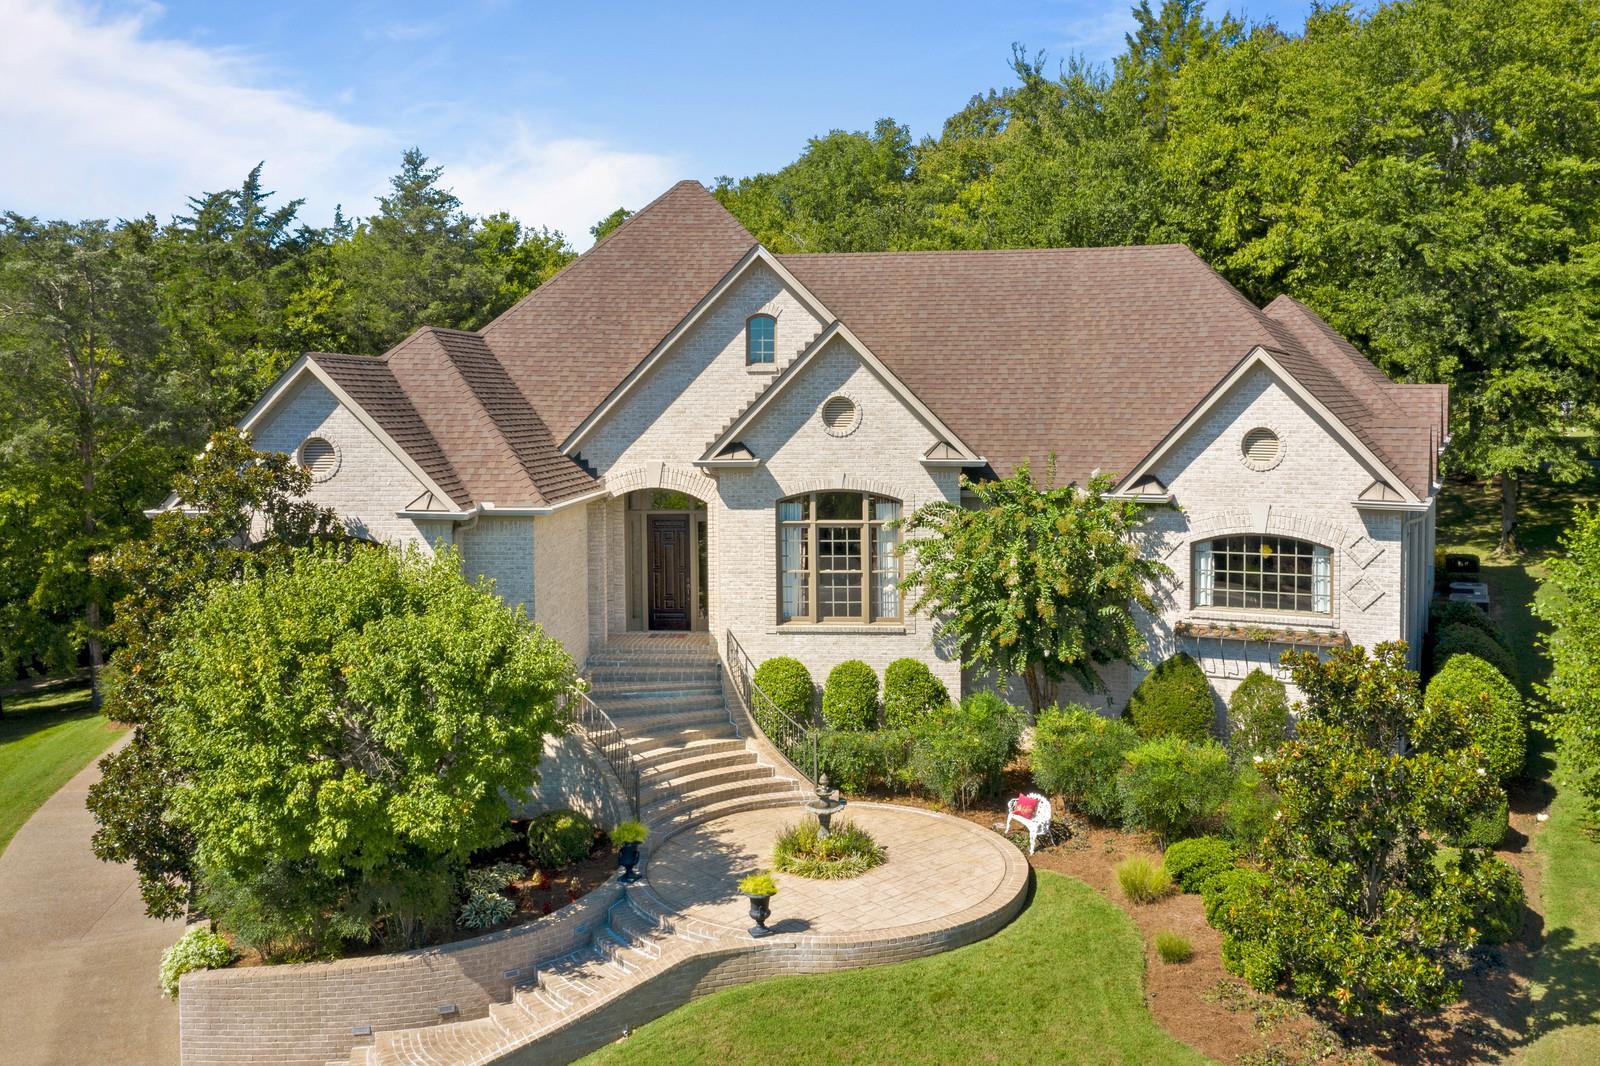 136 Joshuas Run, Goodlettsville, TN 37072 - Goodlettsville, TN real estate listing